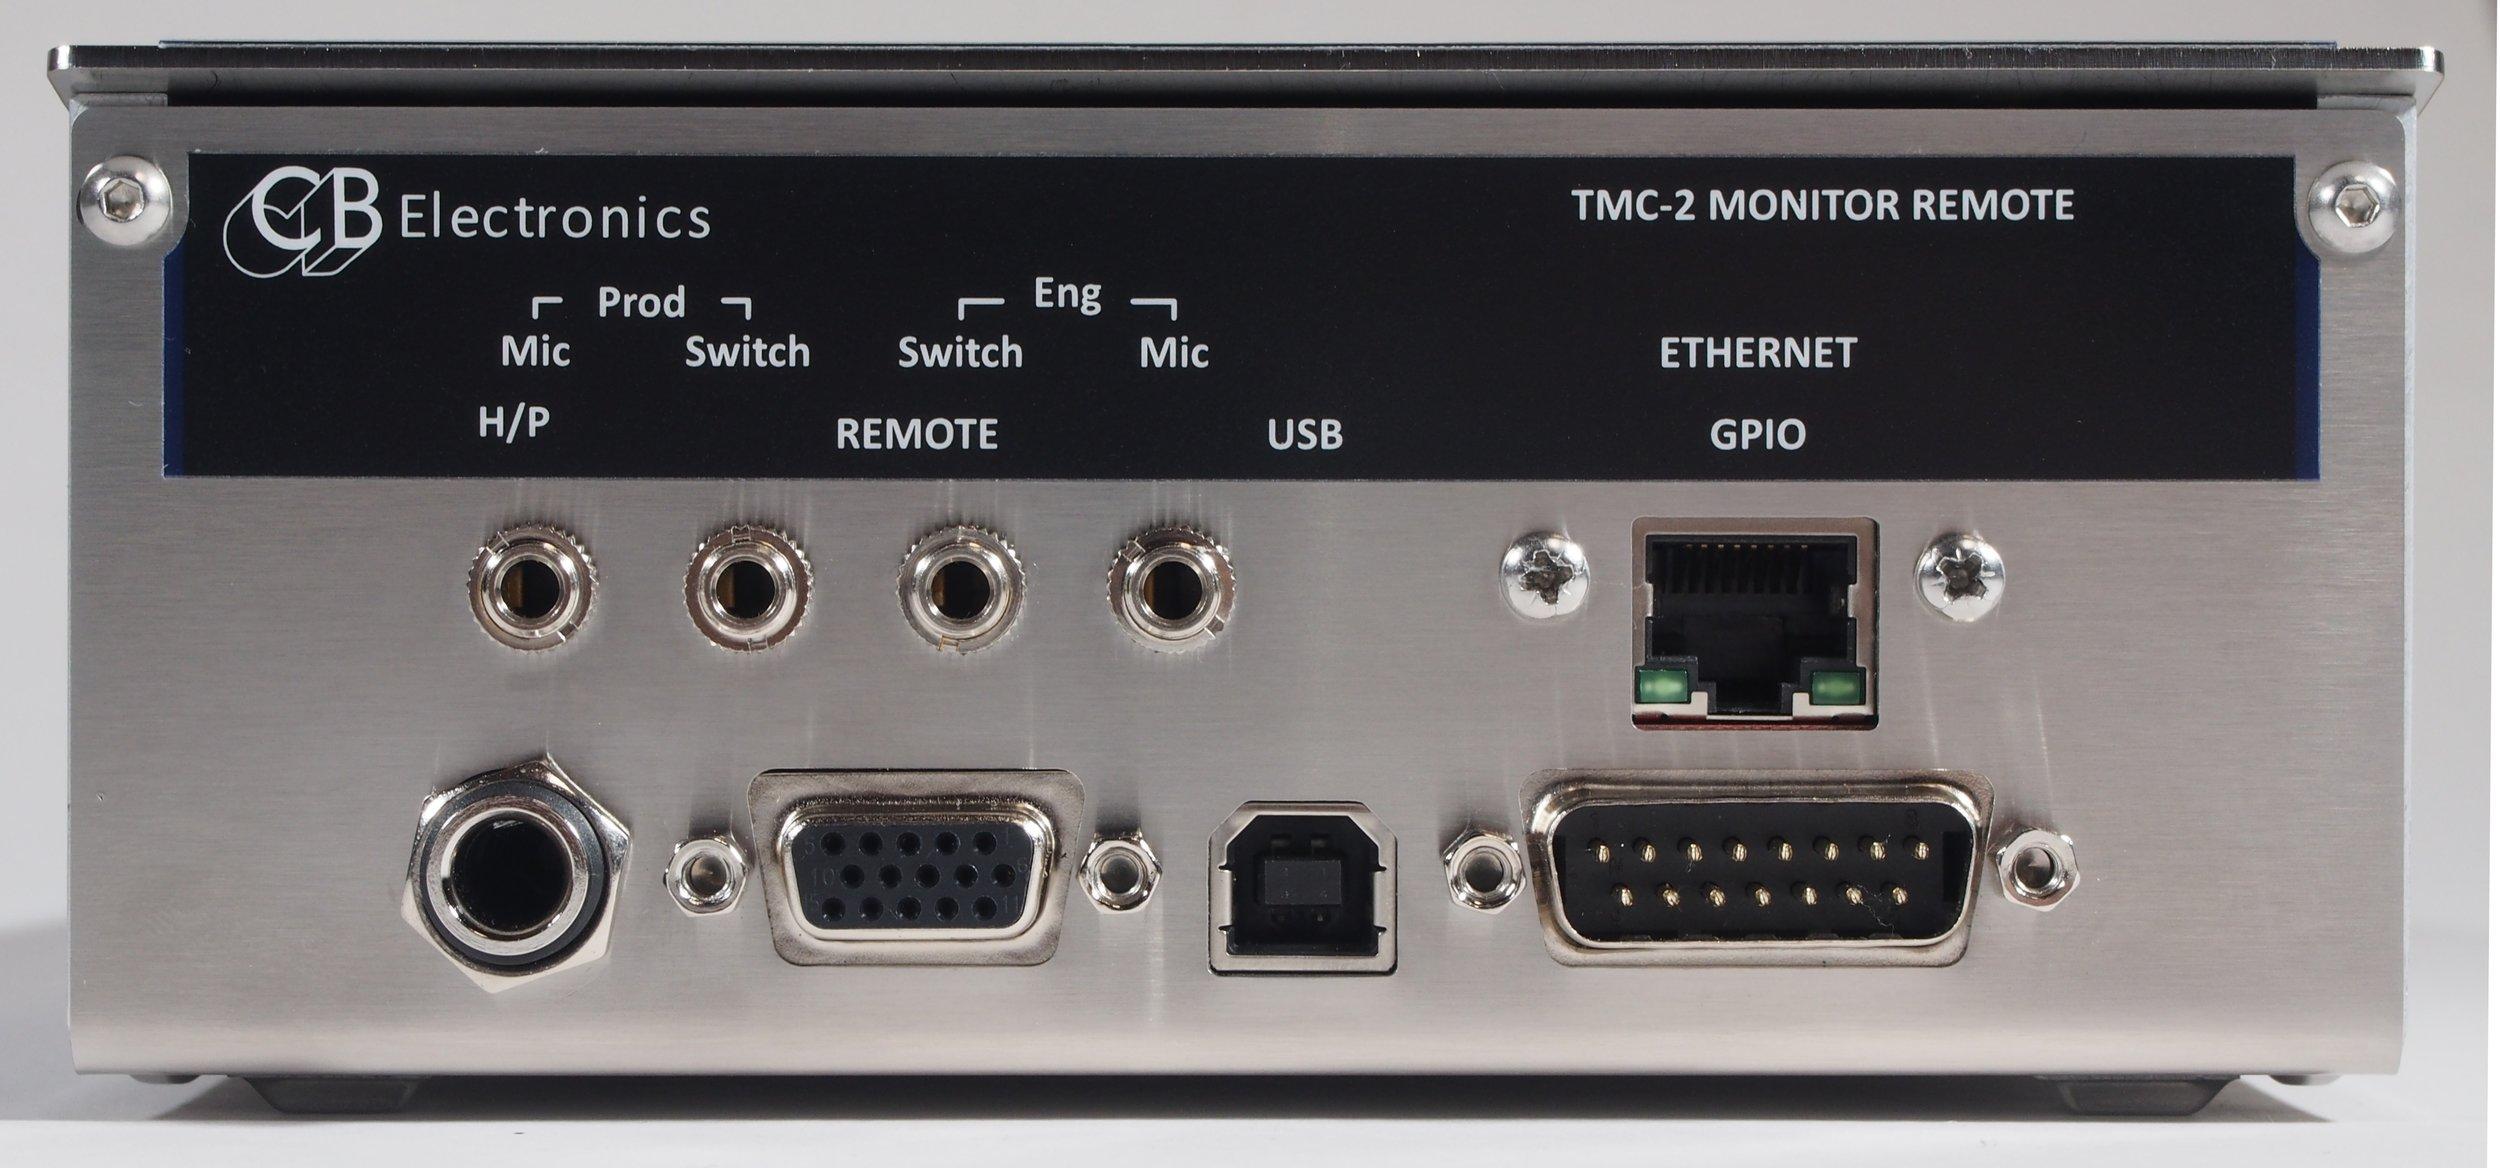 TMC-2 Rear.JPG